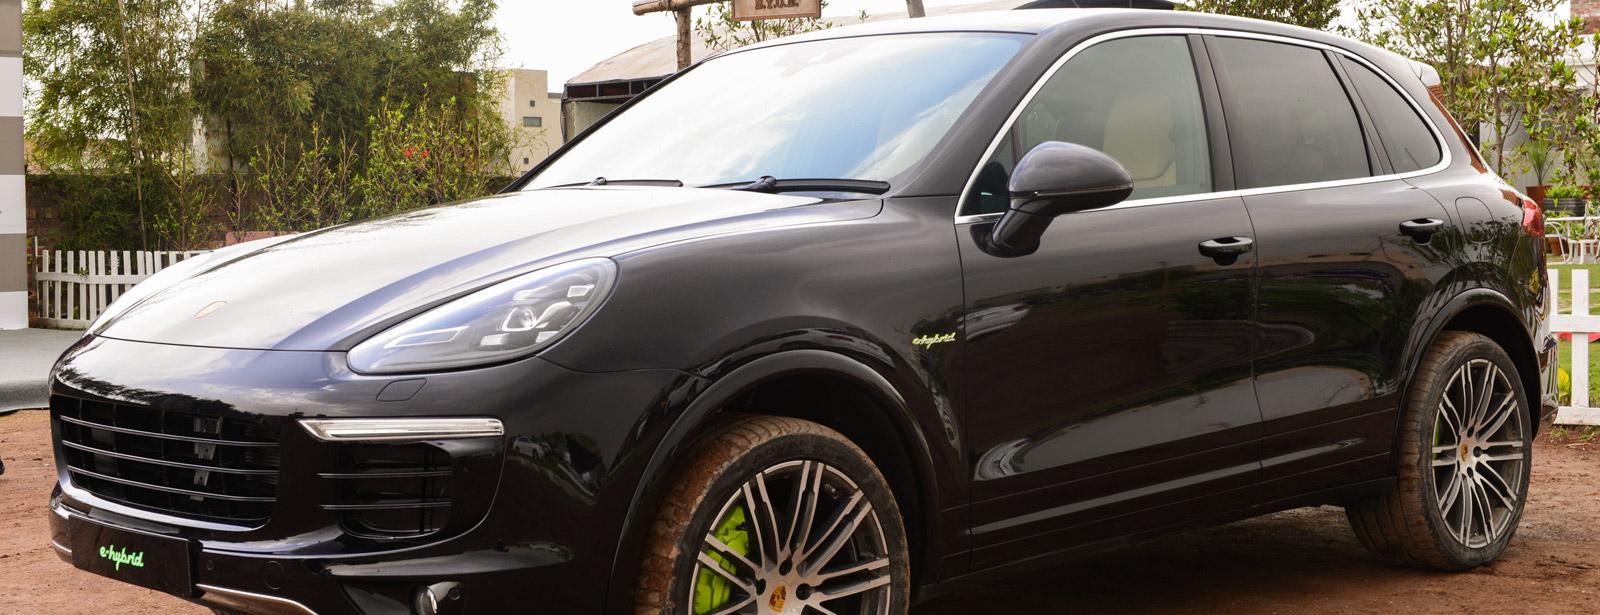 Porsche Test Ride Event in Lahore